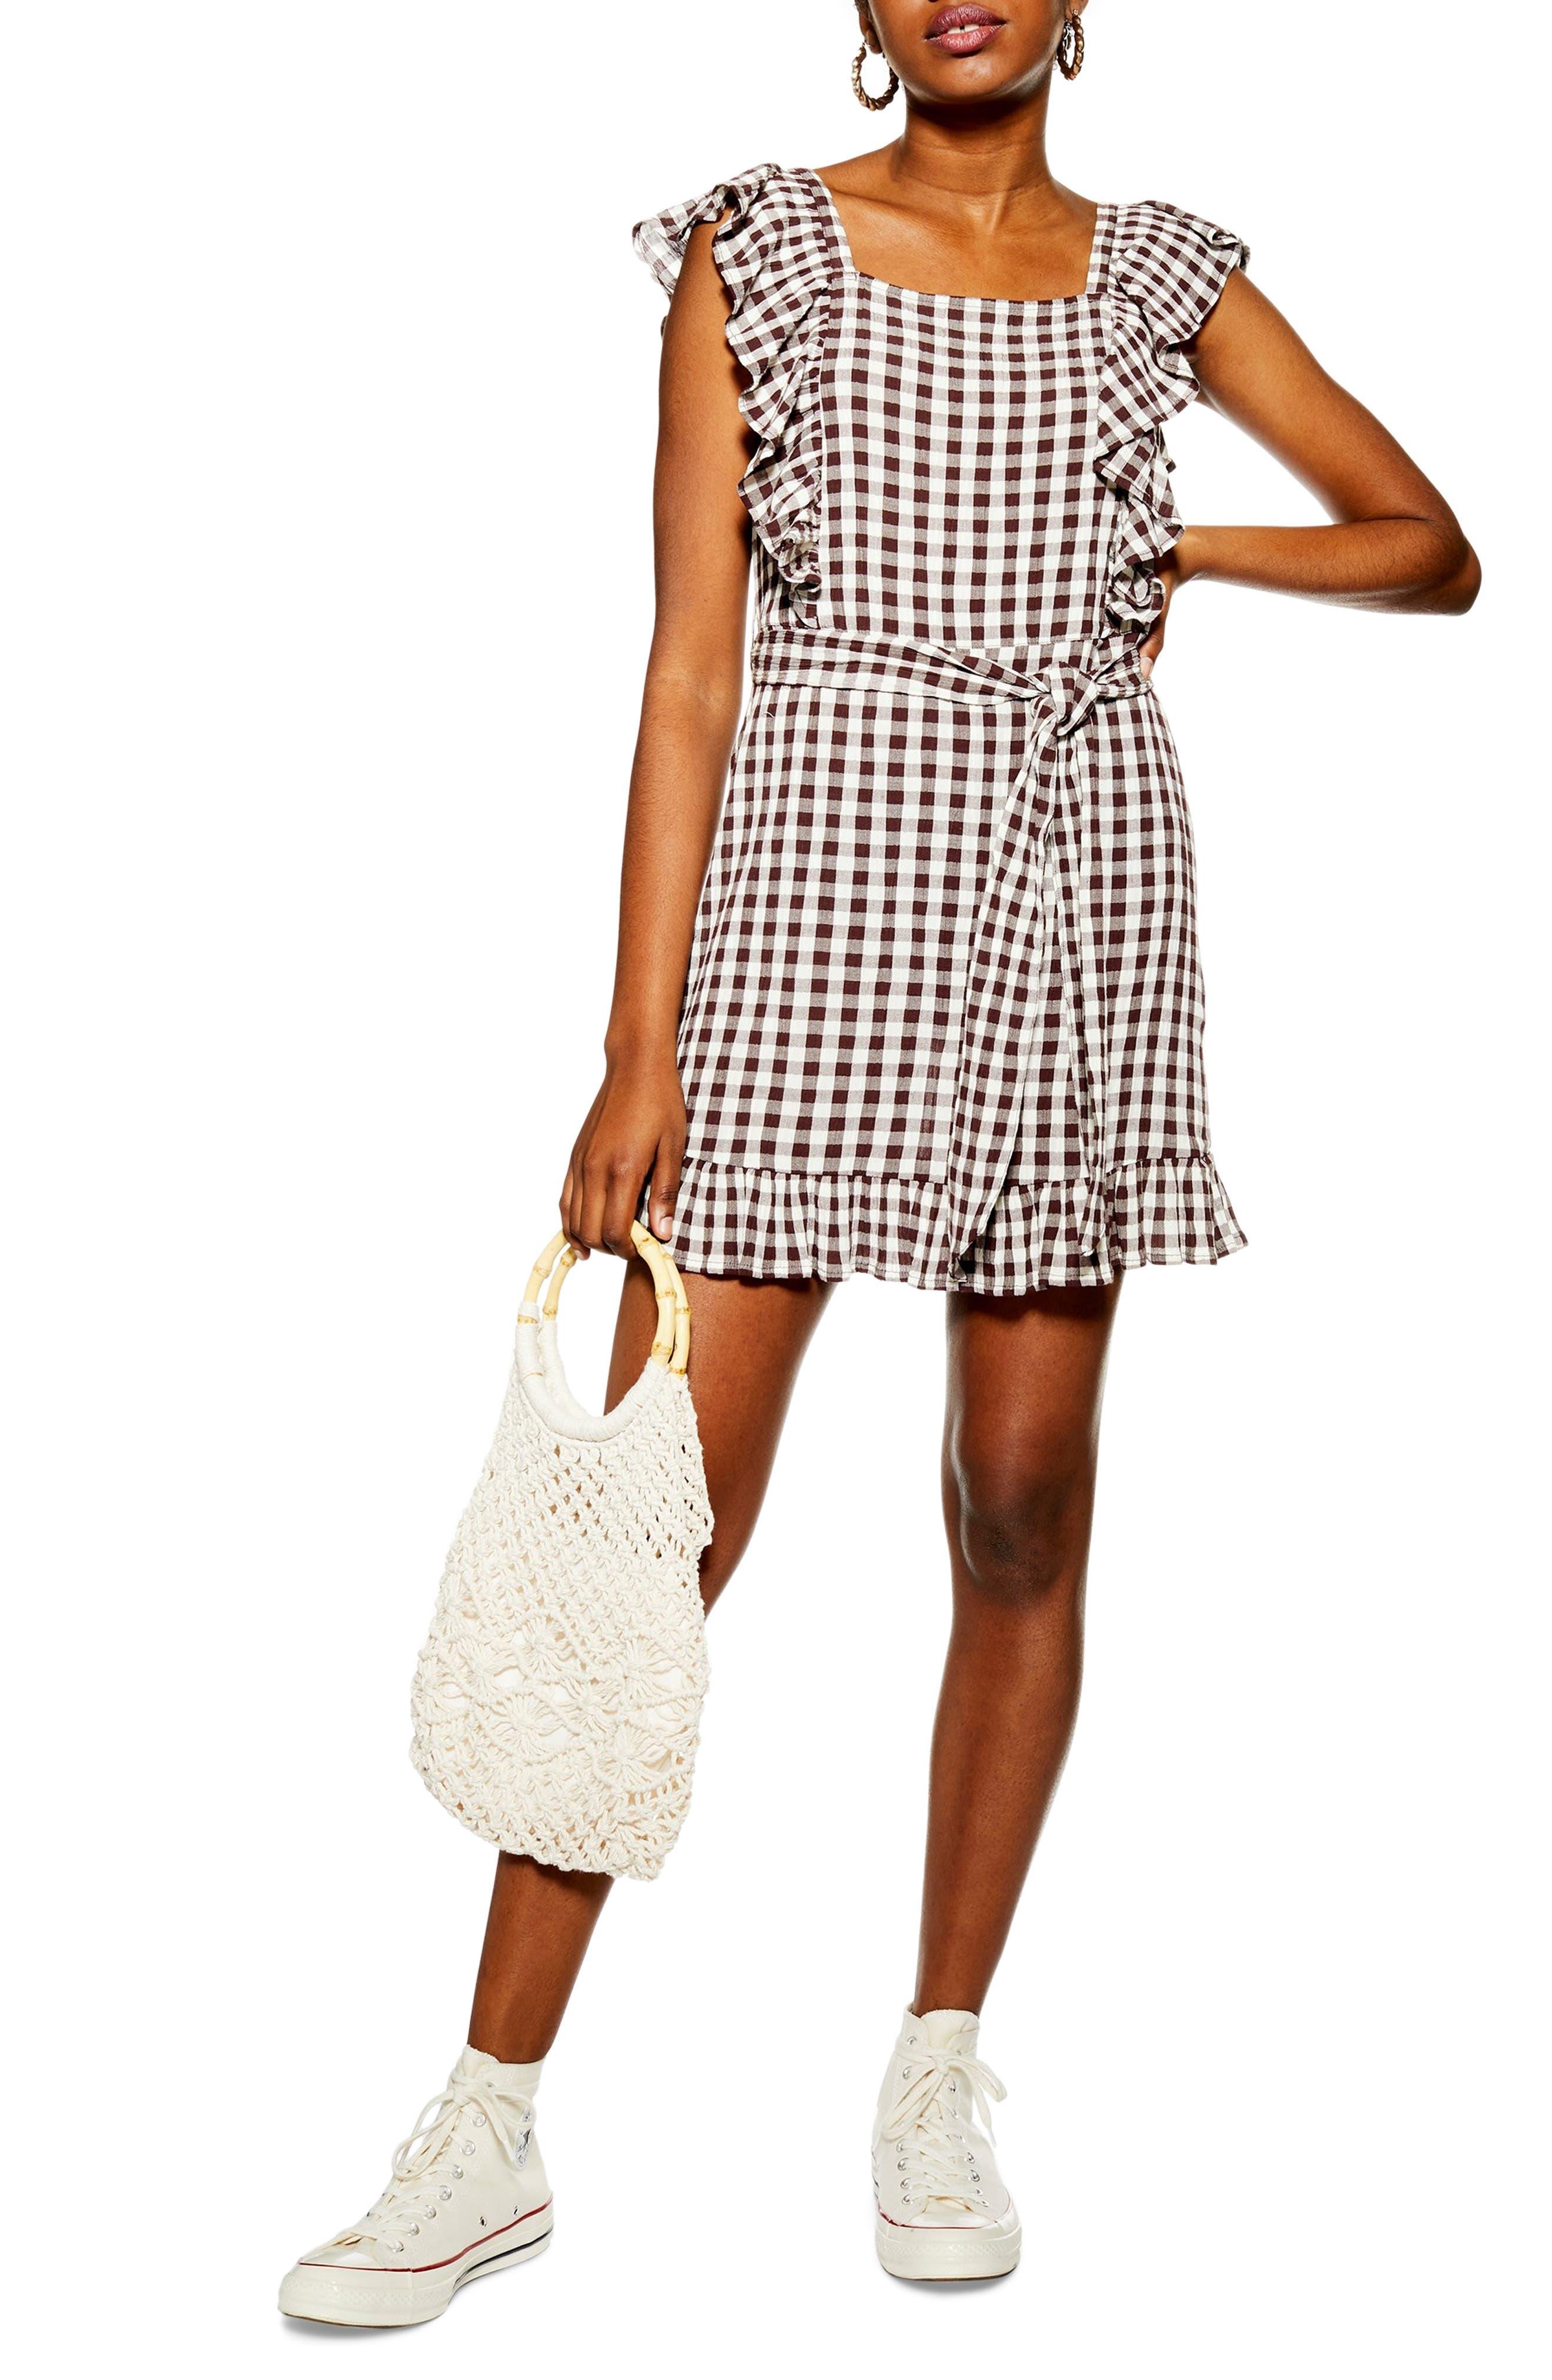 Topshop Gingham Ruffle Minidress, US (fits like 0) - Brown